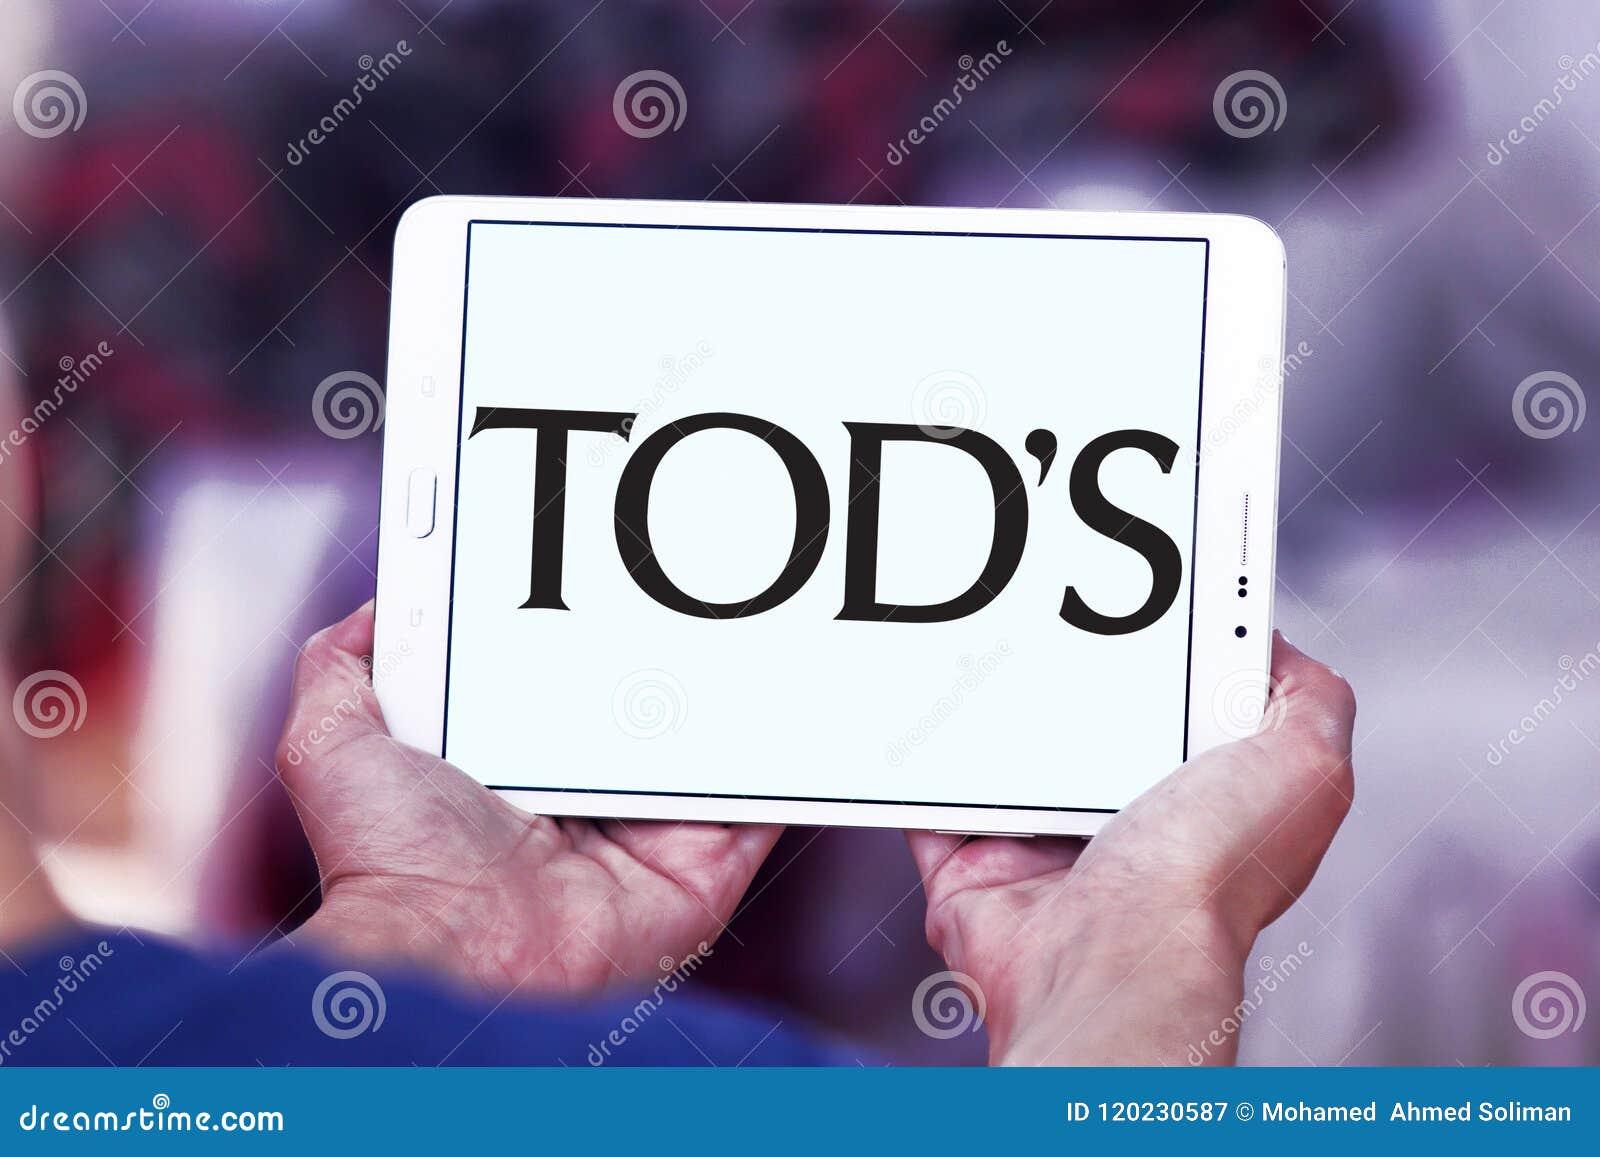 Tod`s fashion brand logo